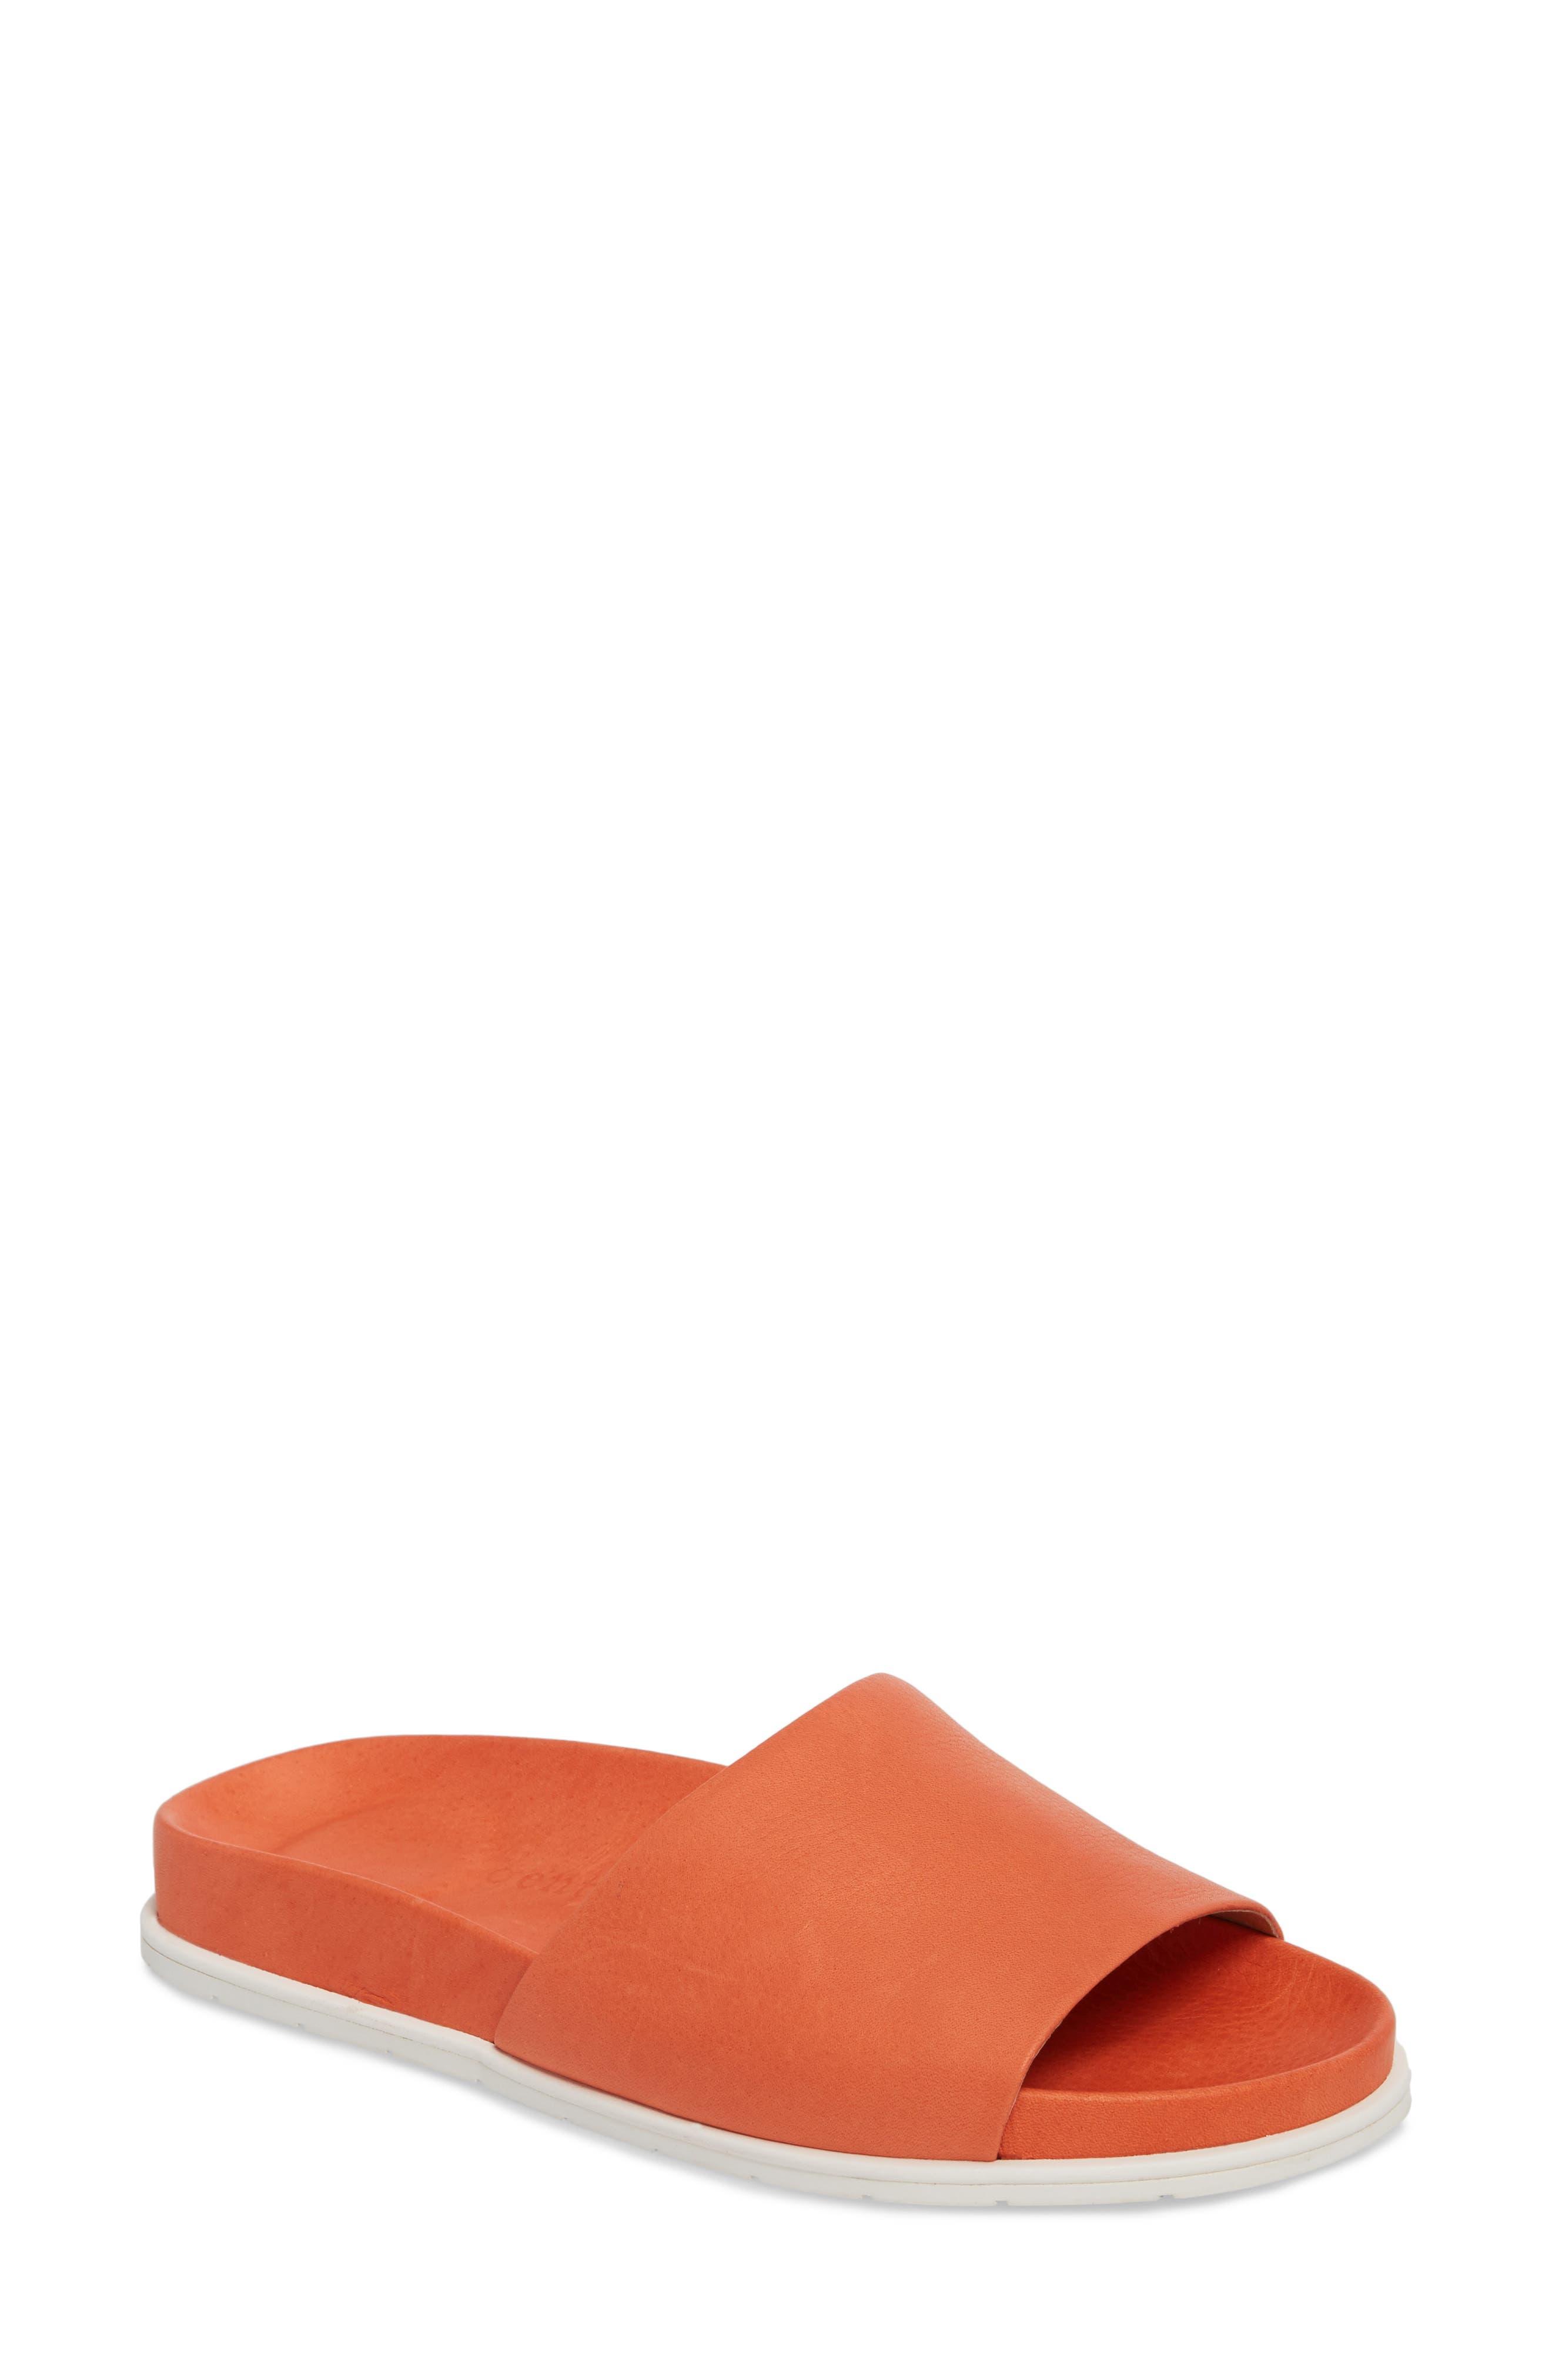 by Kenneth Cole Iona Slide Sandal,                         Main,                         color, Orange Leather